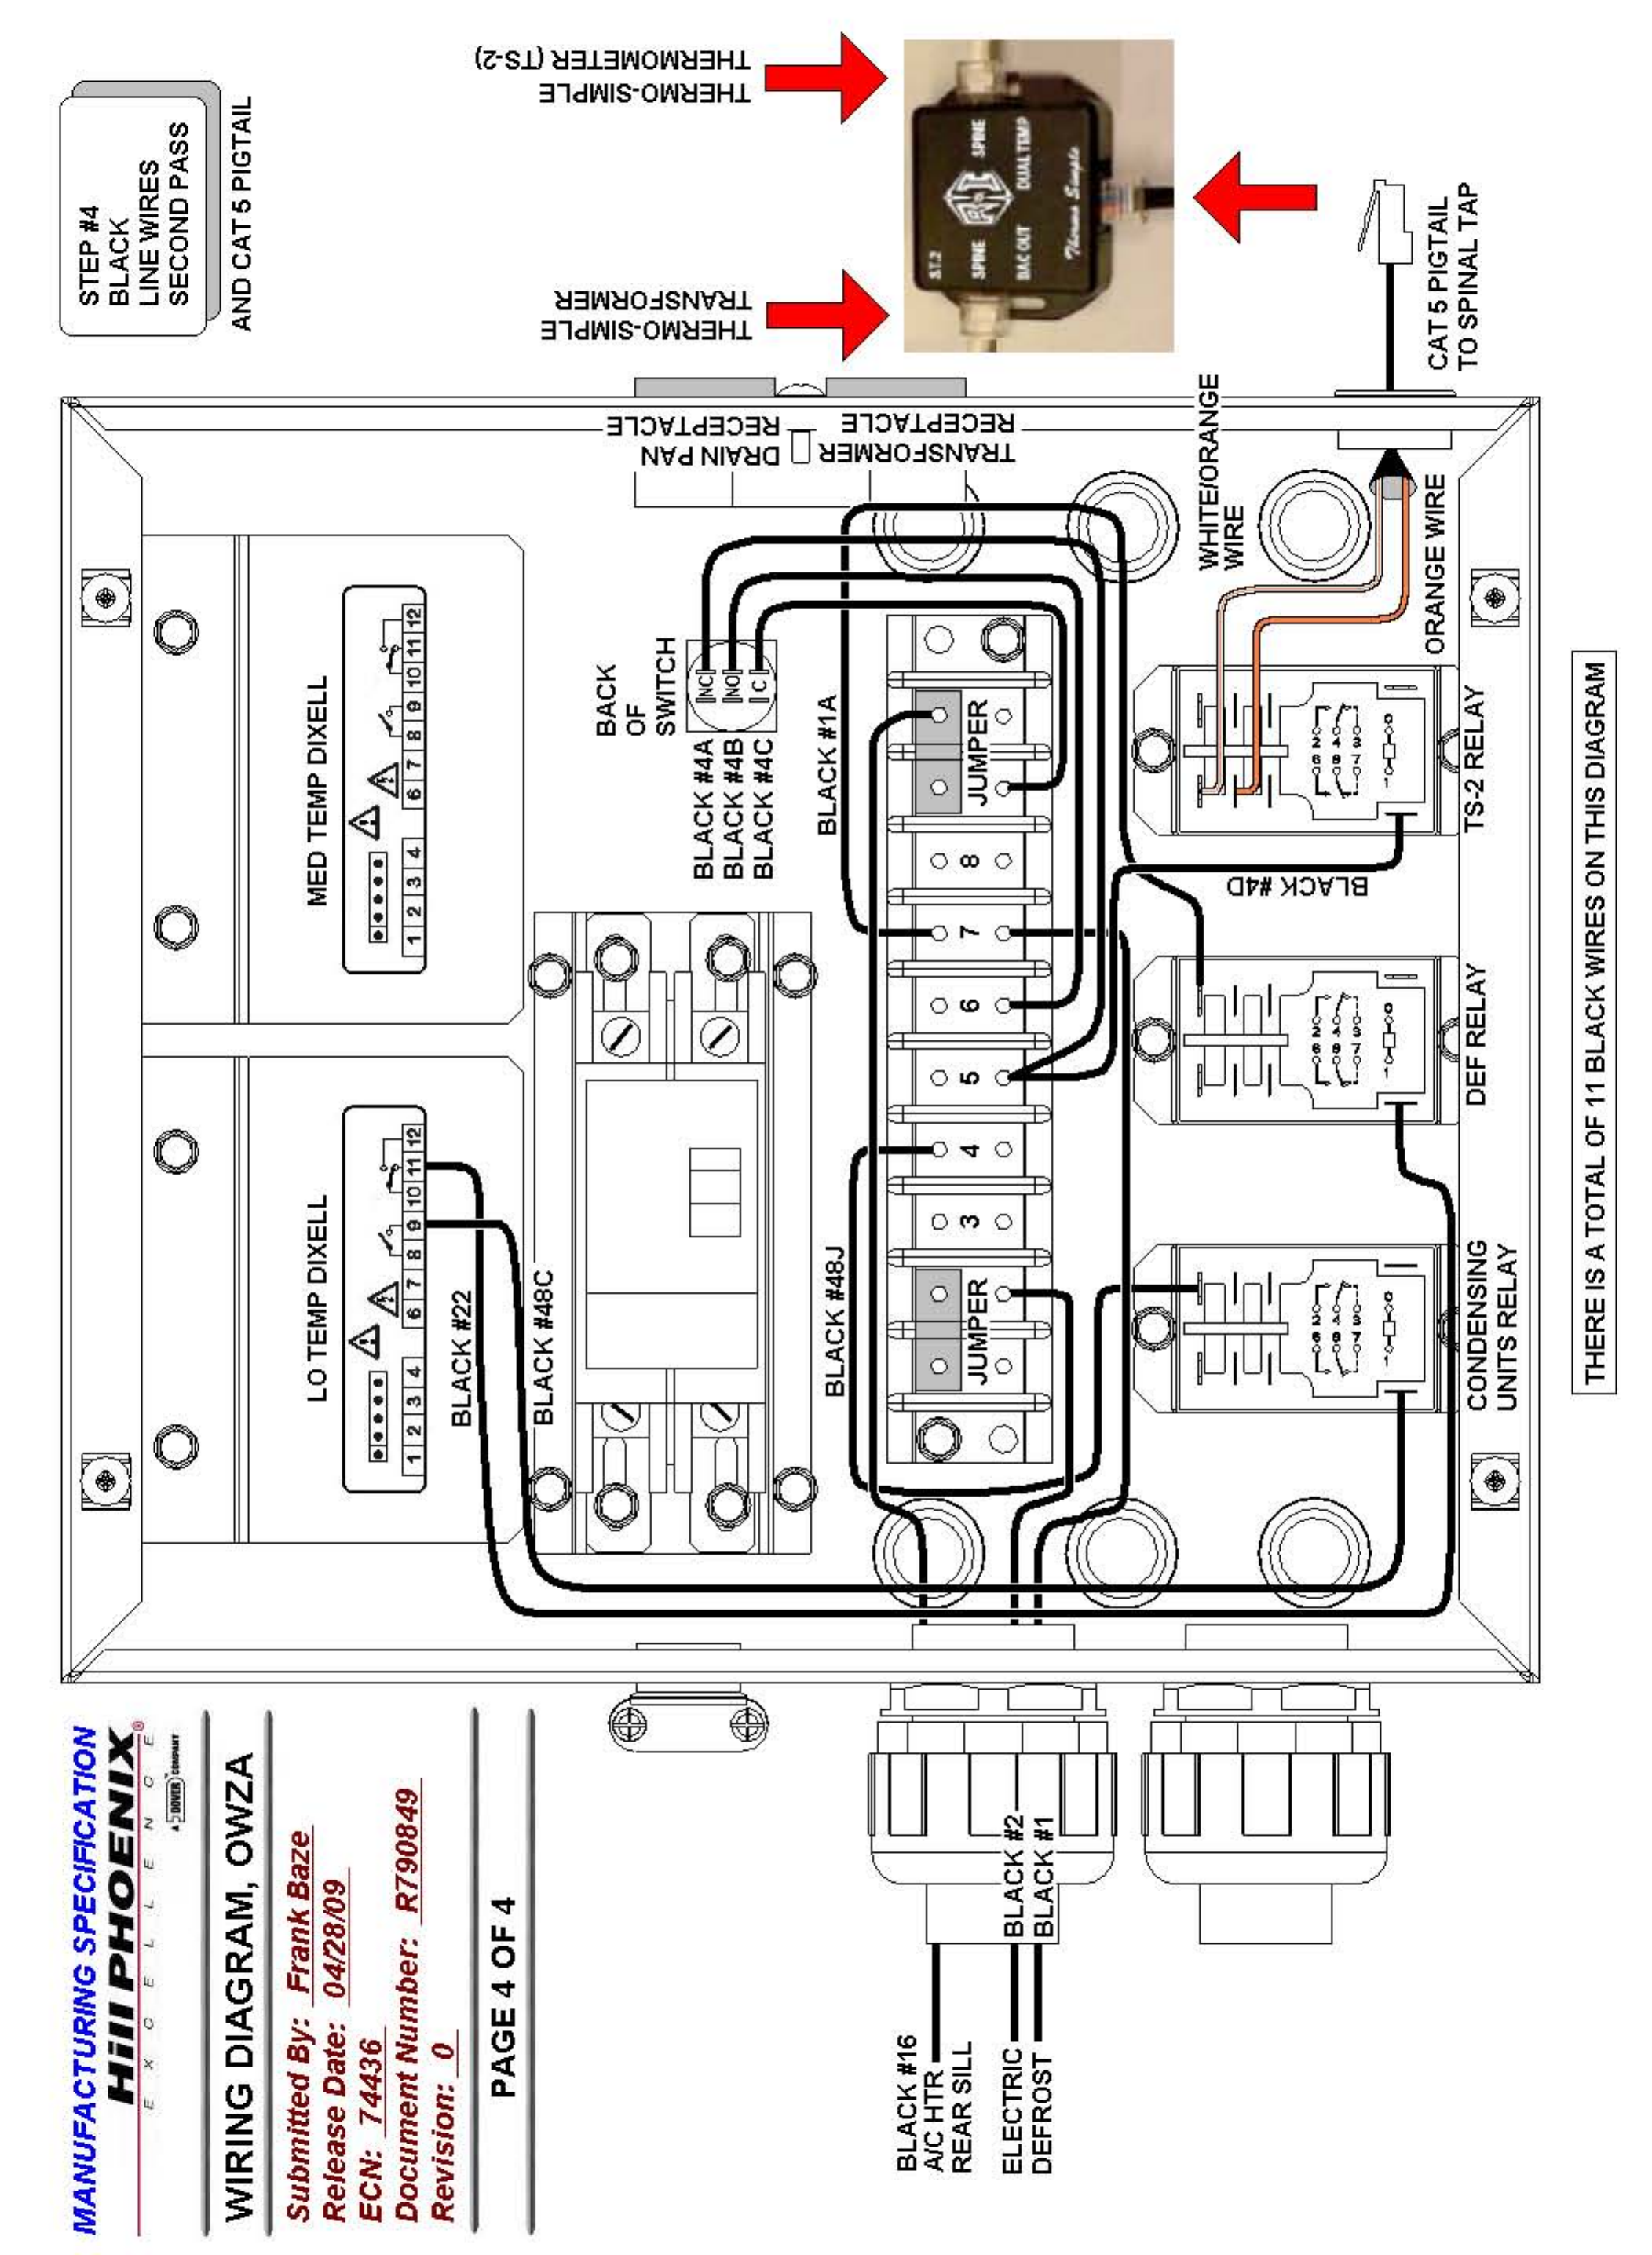 Hill Phoenix P074749f Users Manual Owza V1 Wiring Diagram Appendix C